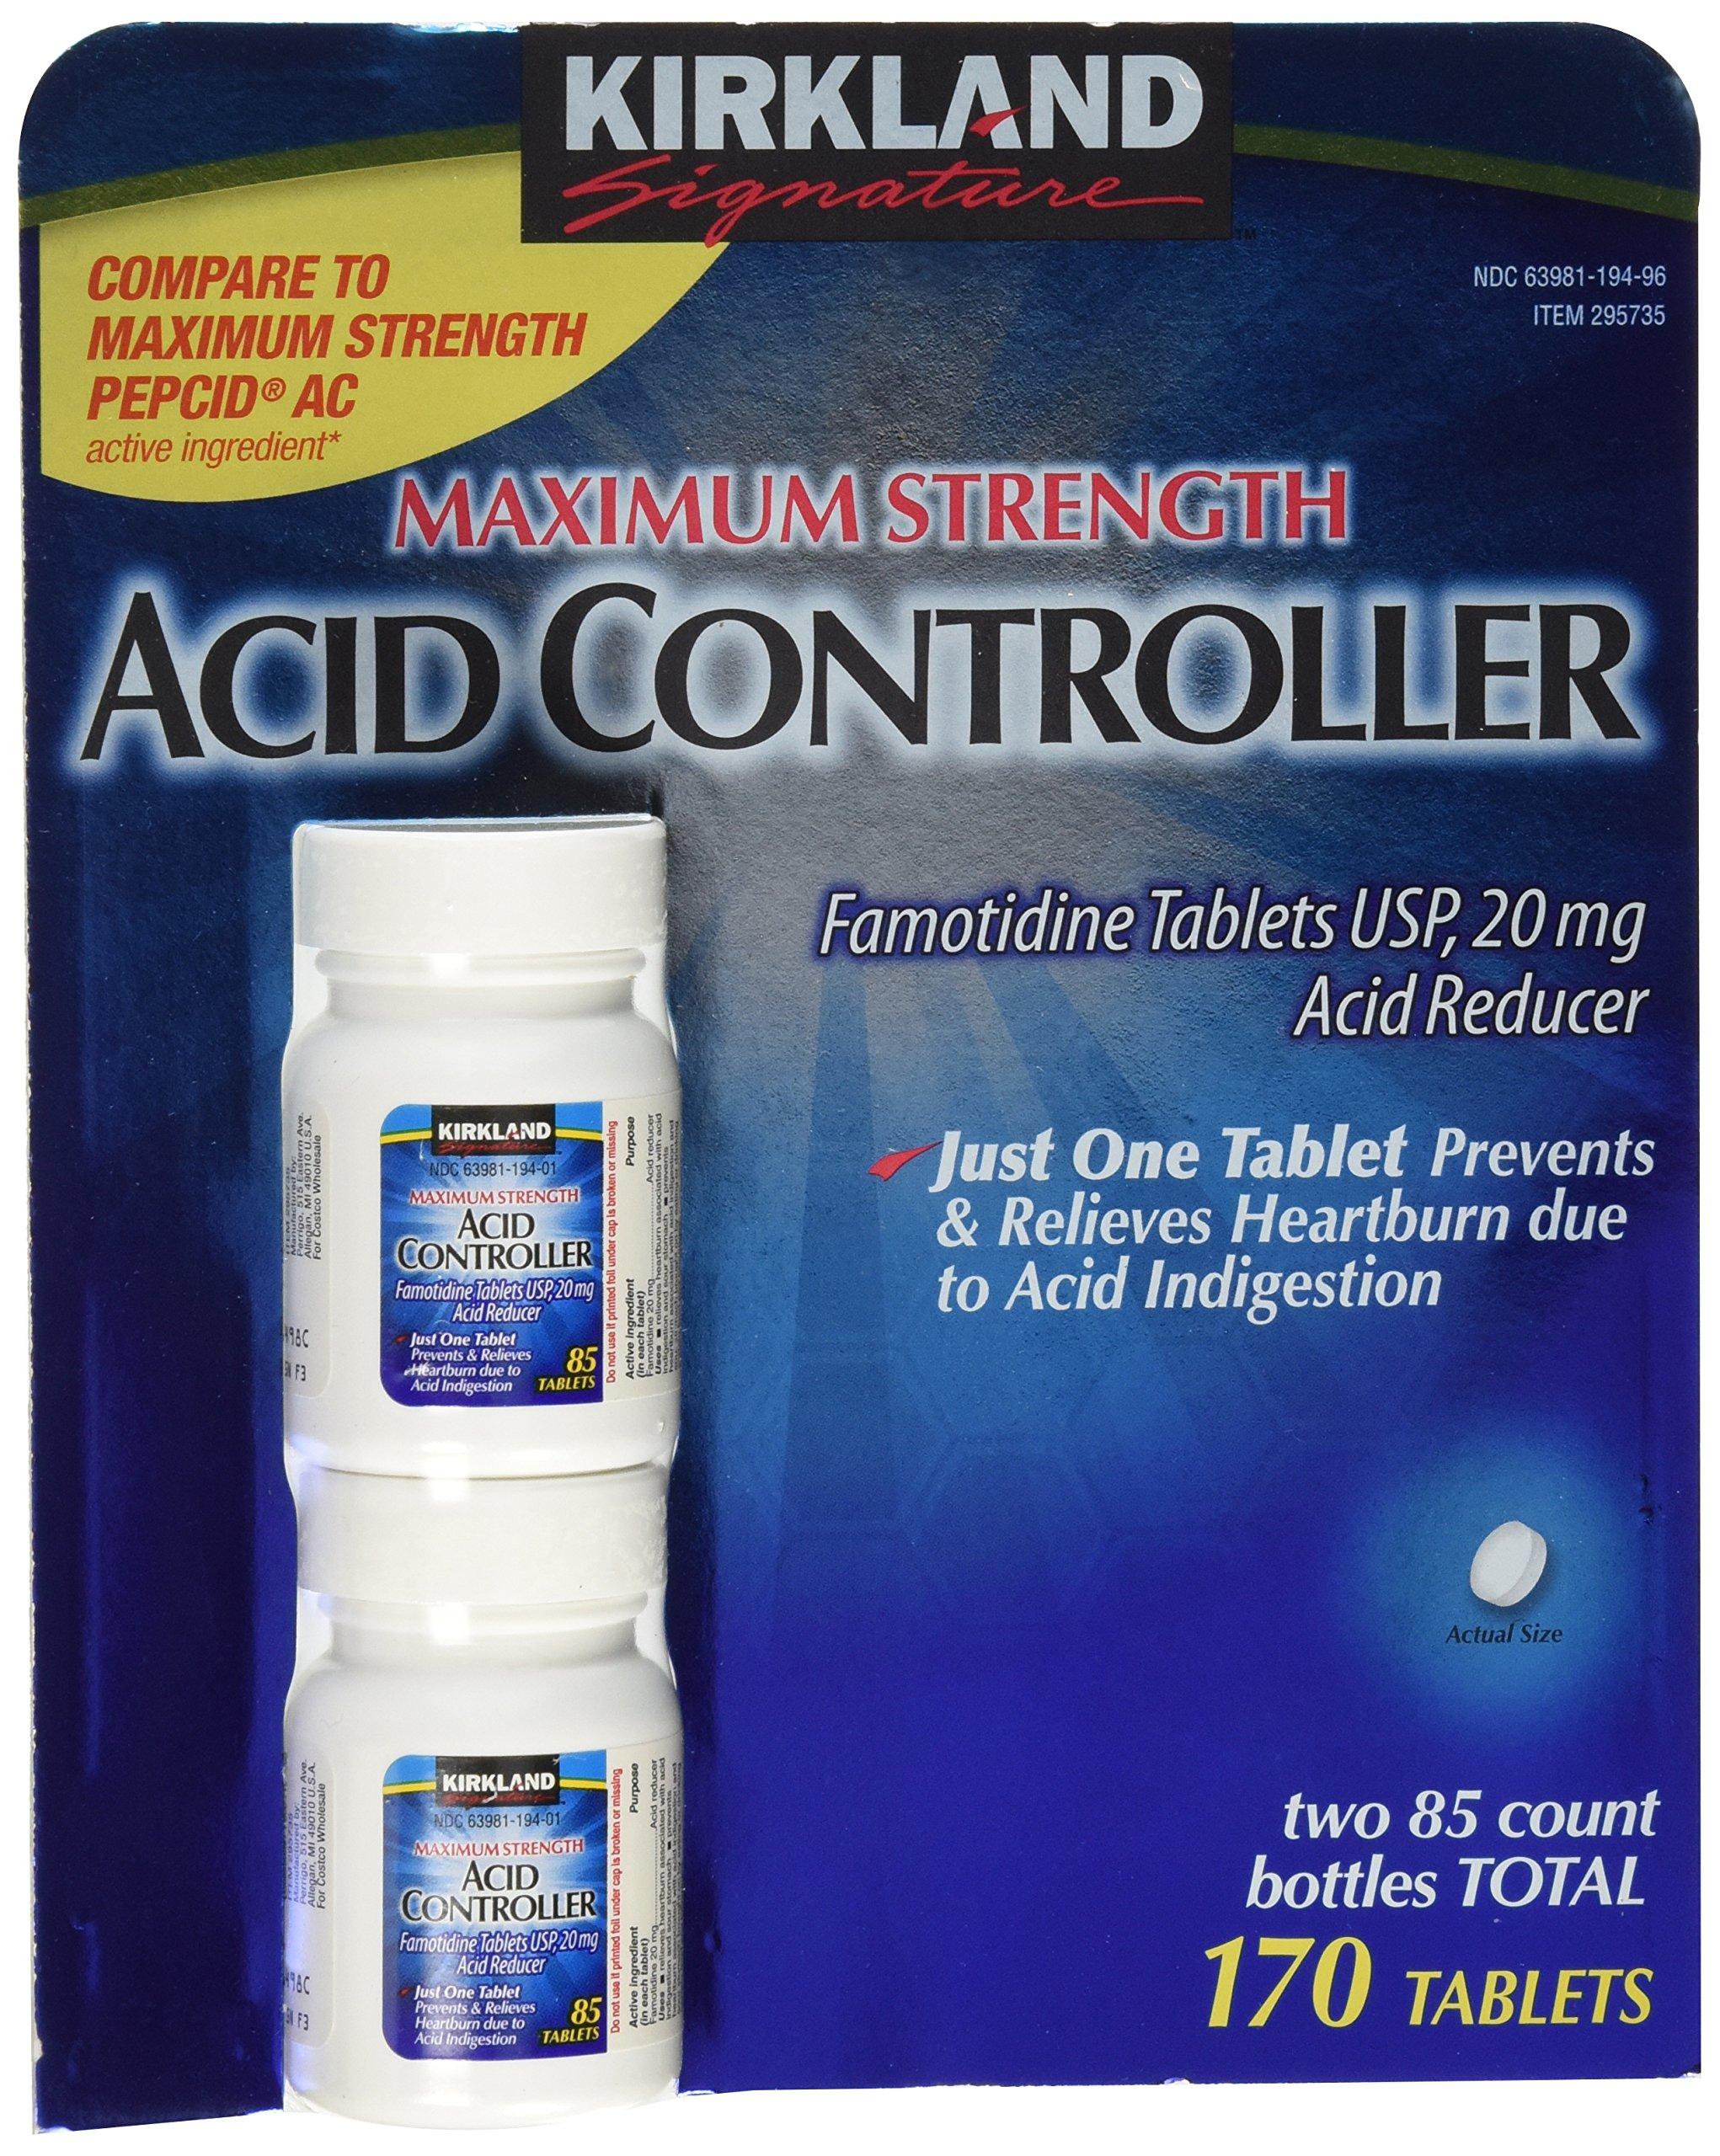 Kirkland Signature Acid Controller, 20 Mg Famotidine Tablet, 170 Tablets